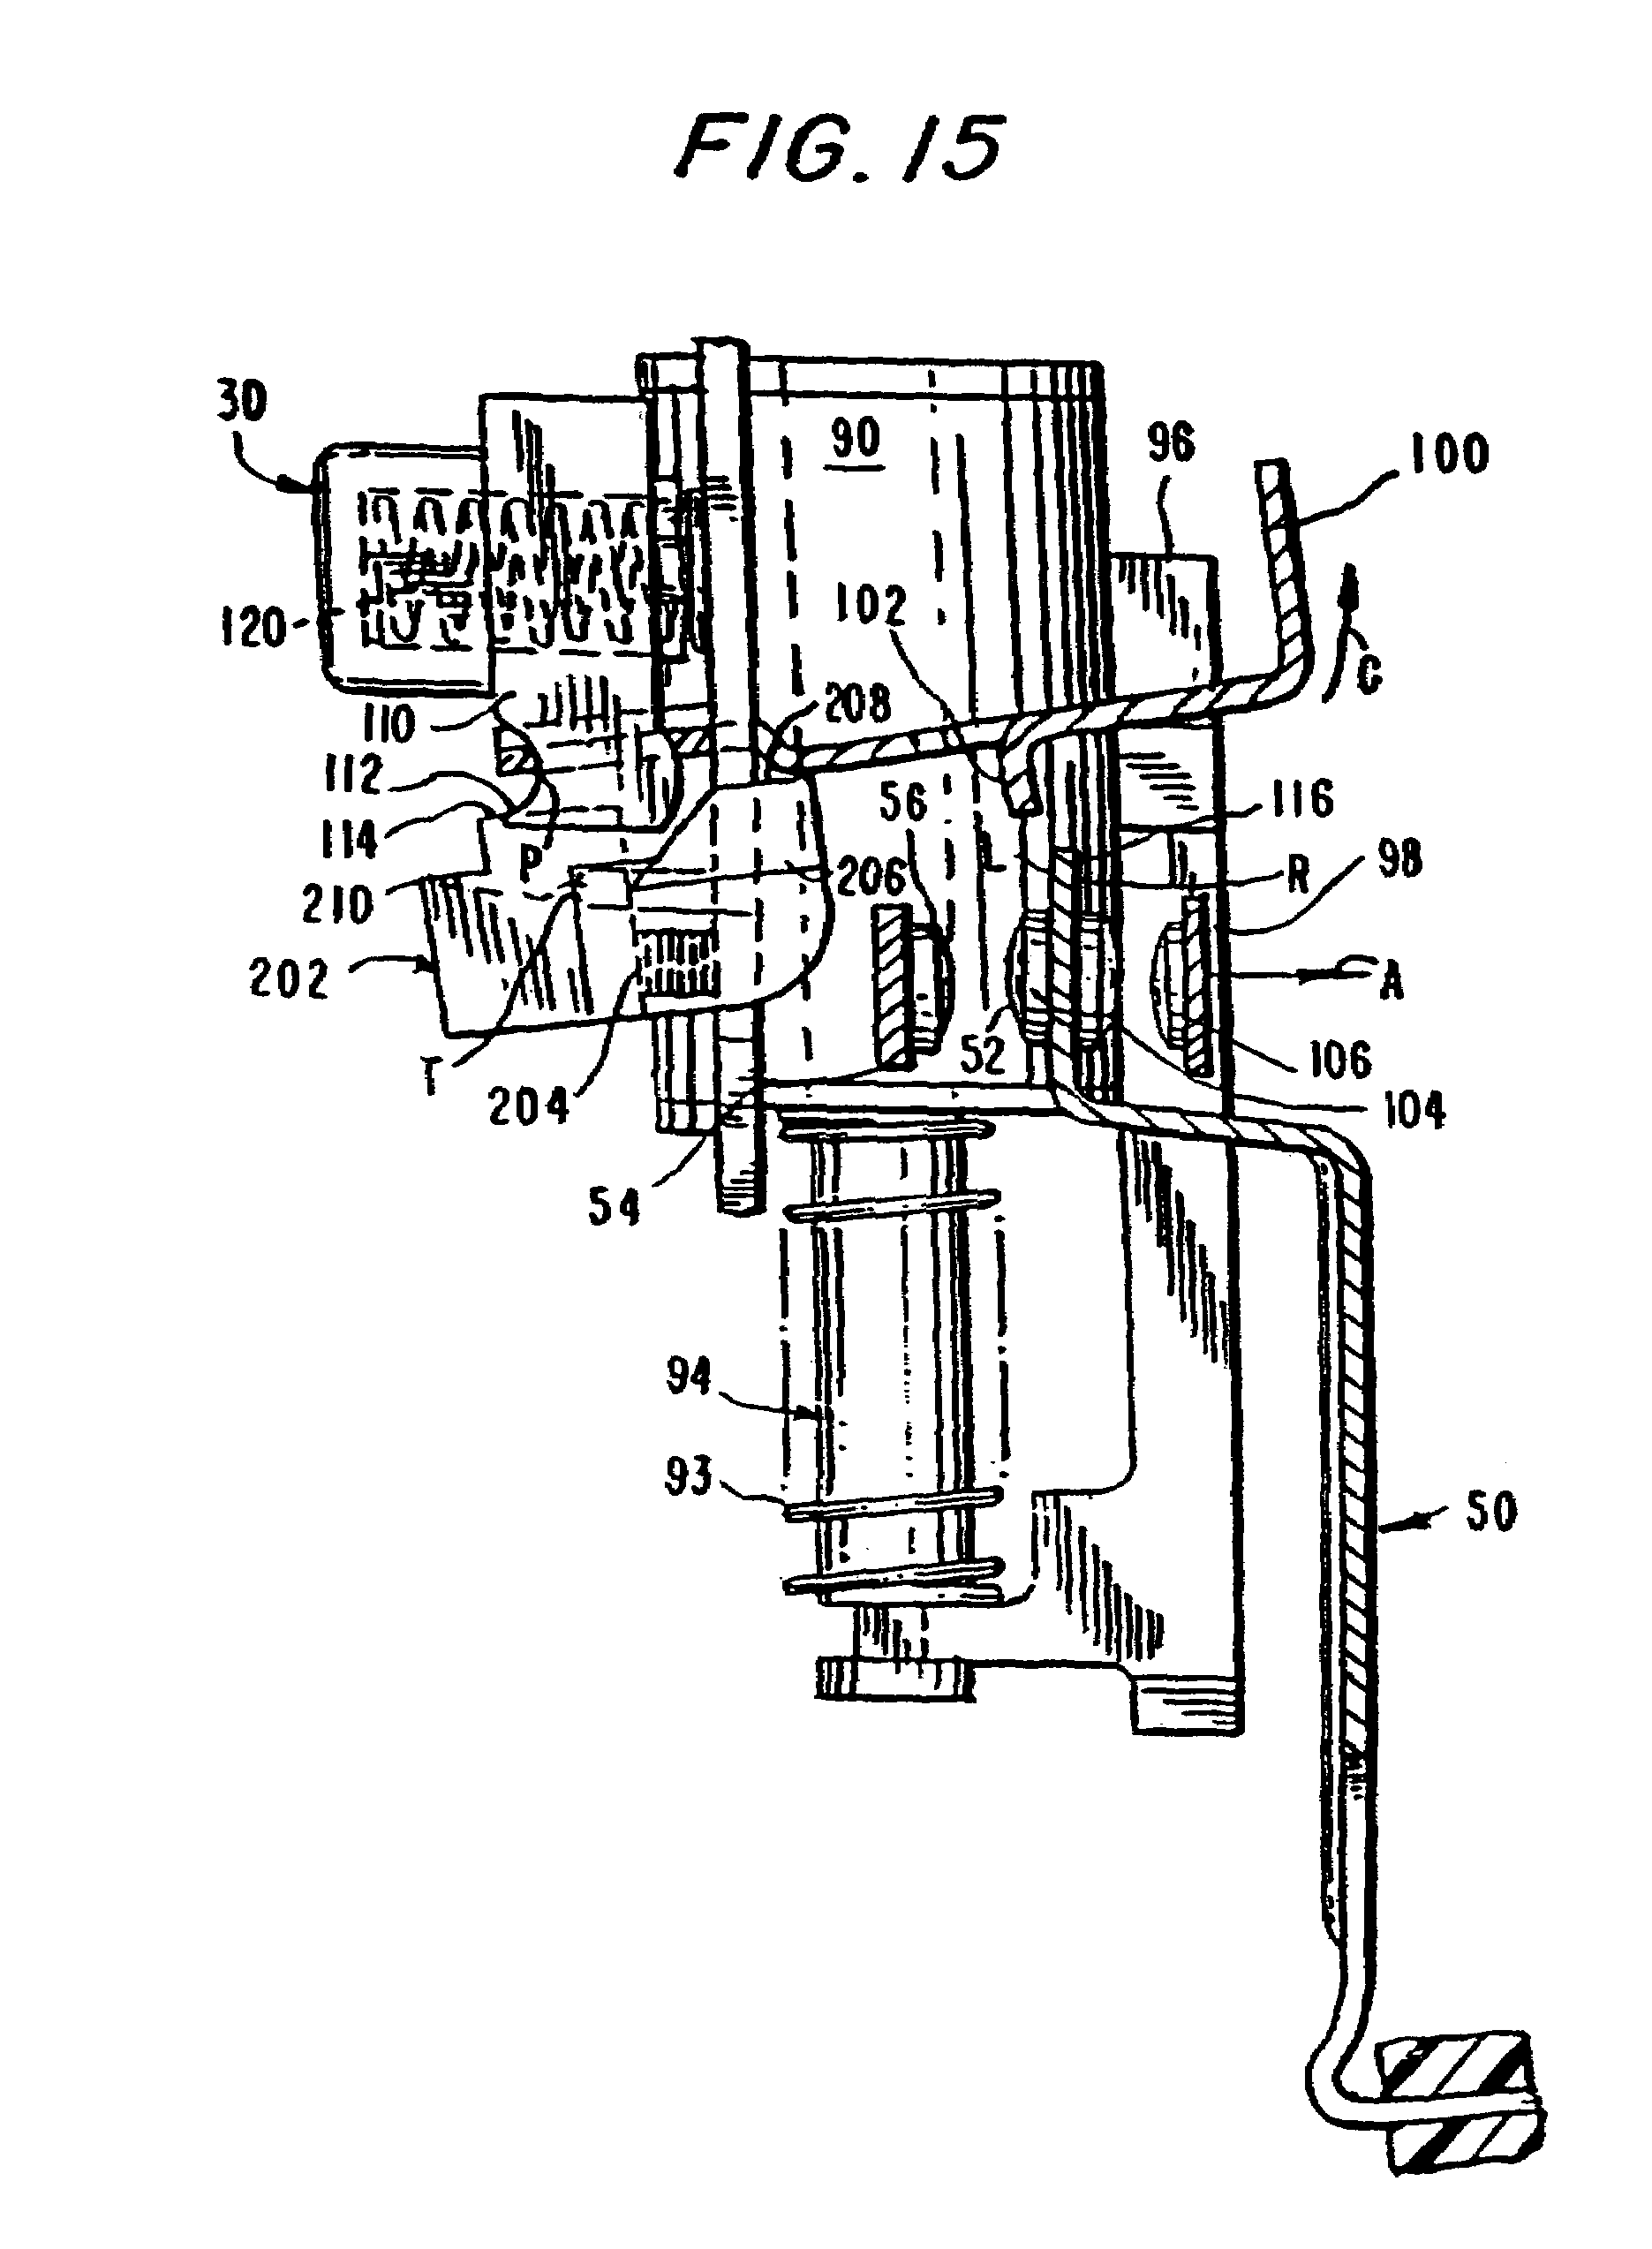 Nema 5 15r wiring diagram wiring auto wiring diagrams instructions